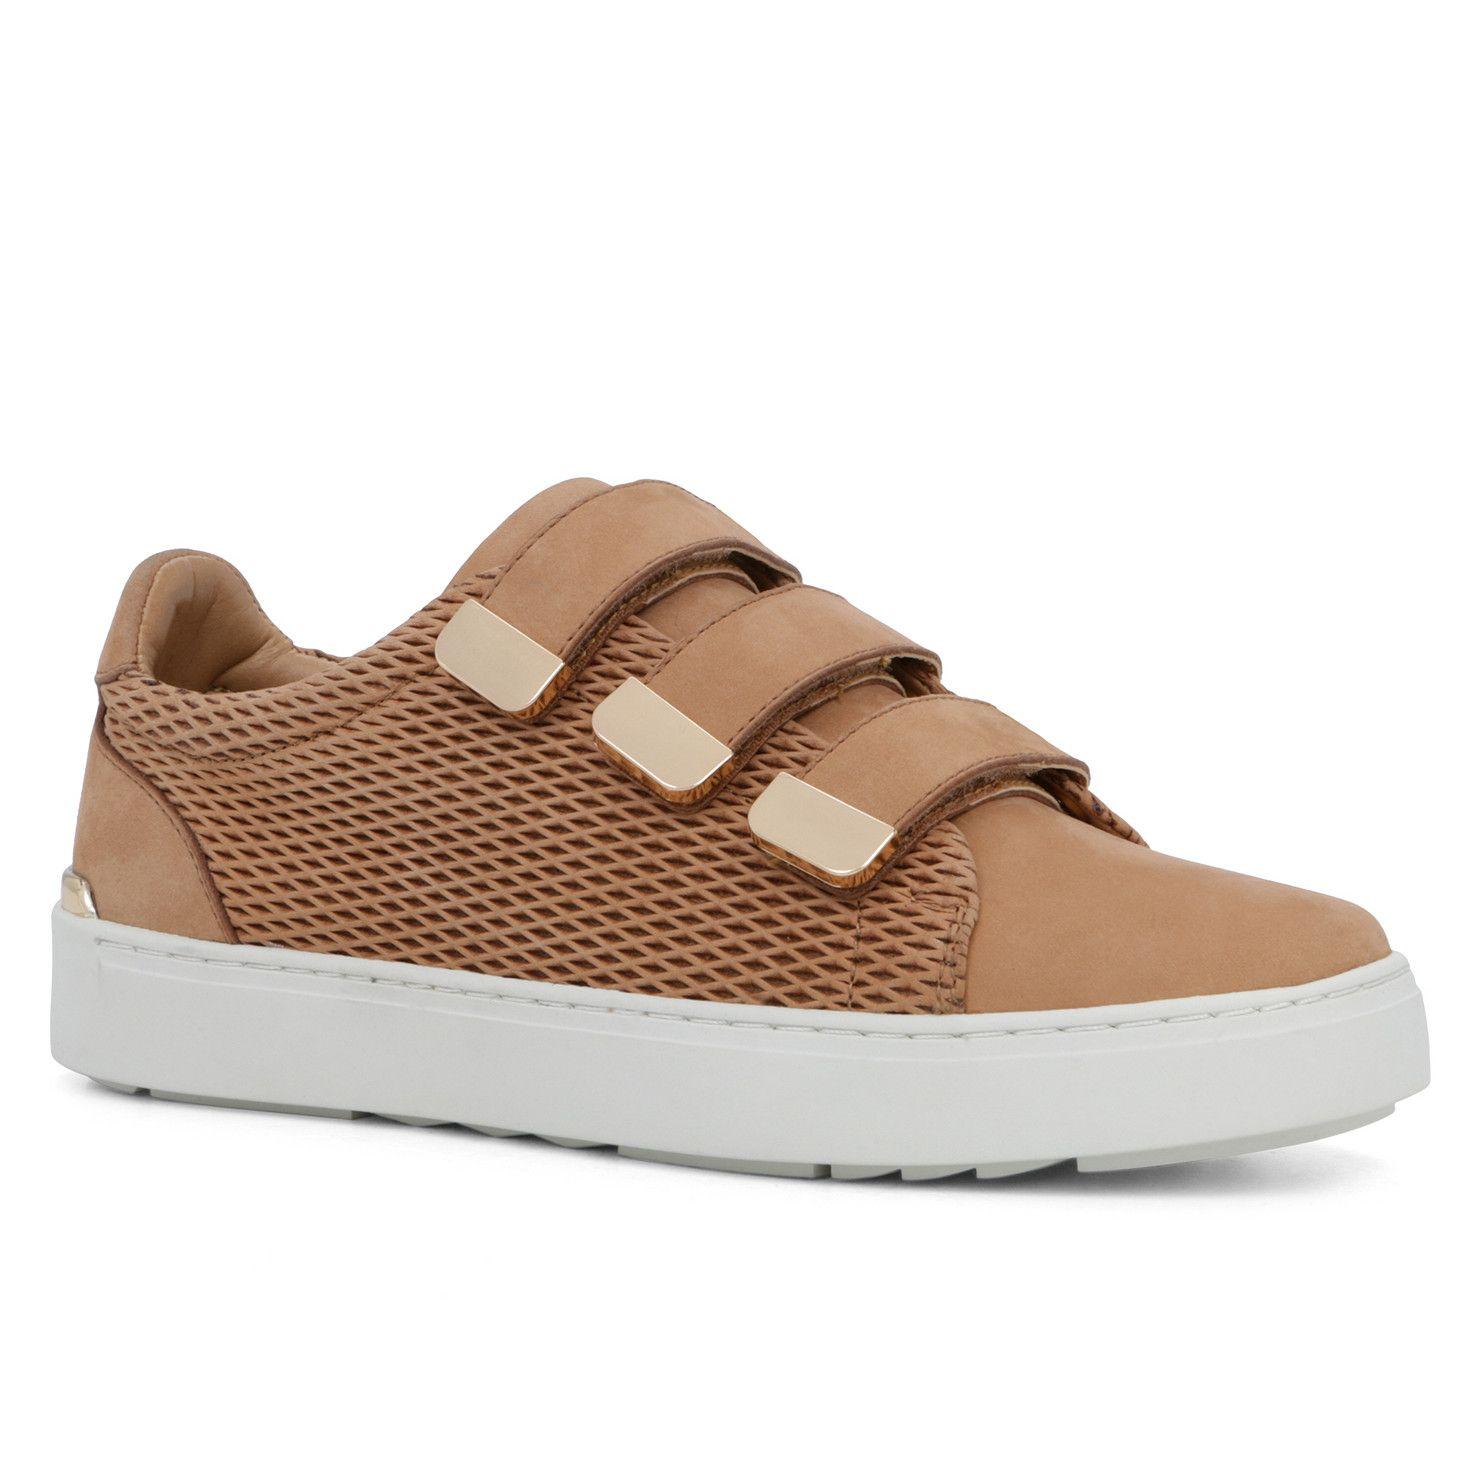 aldo shoes london uk area airports